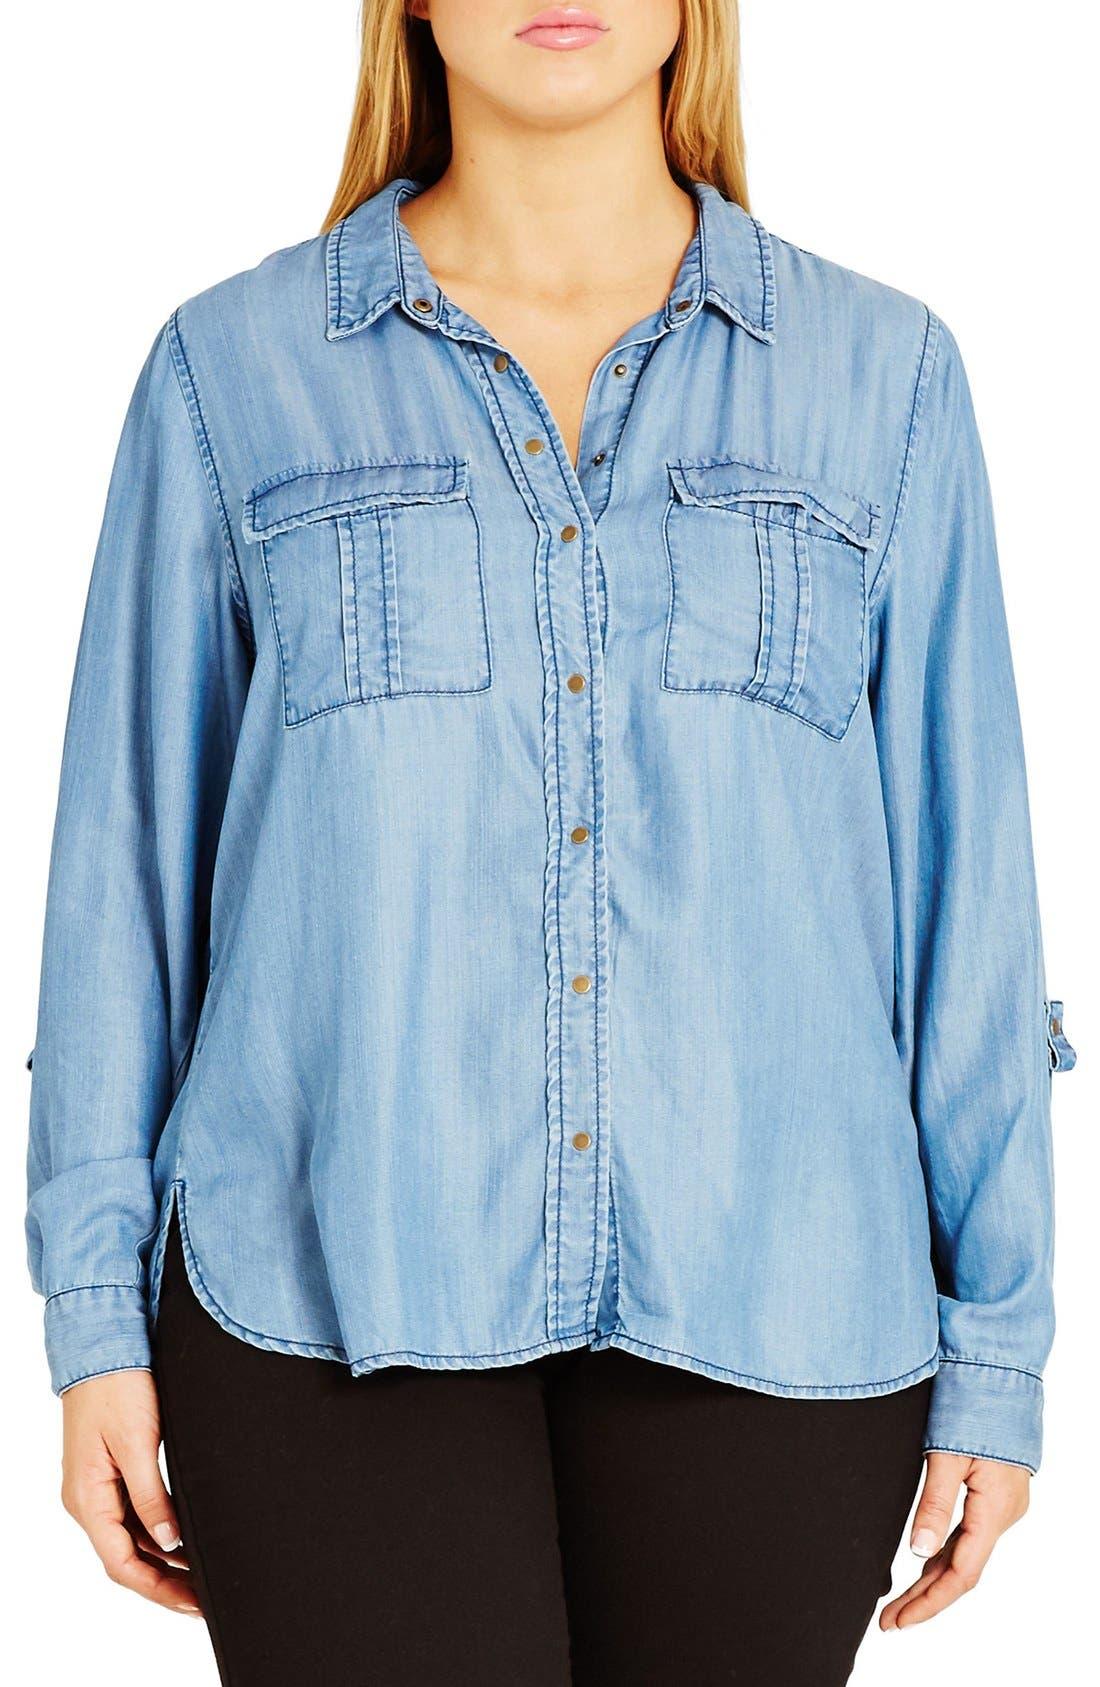 City Chic 'Miss Military' Denim Shirt (Plus Size)